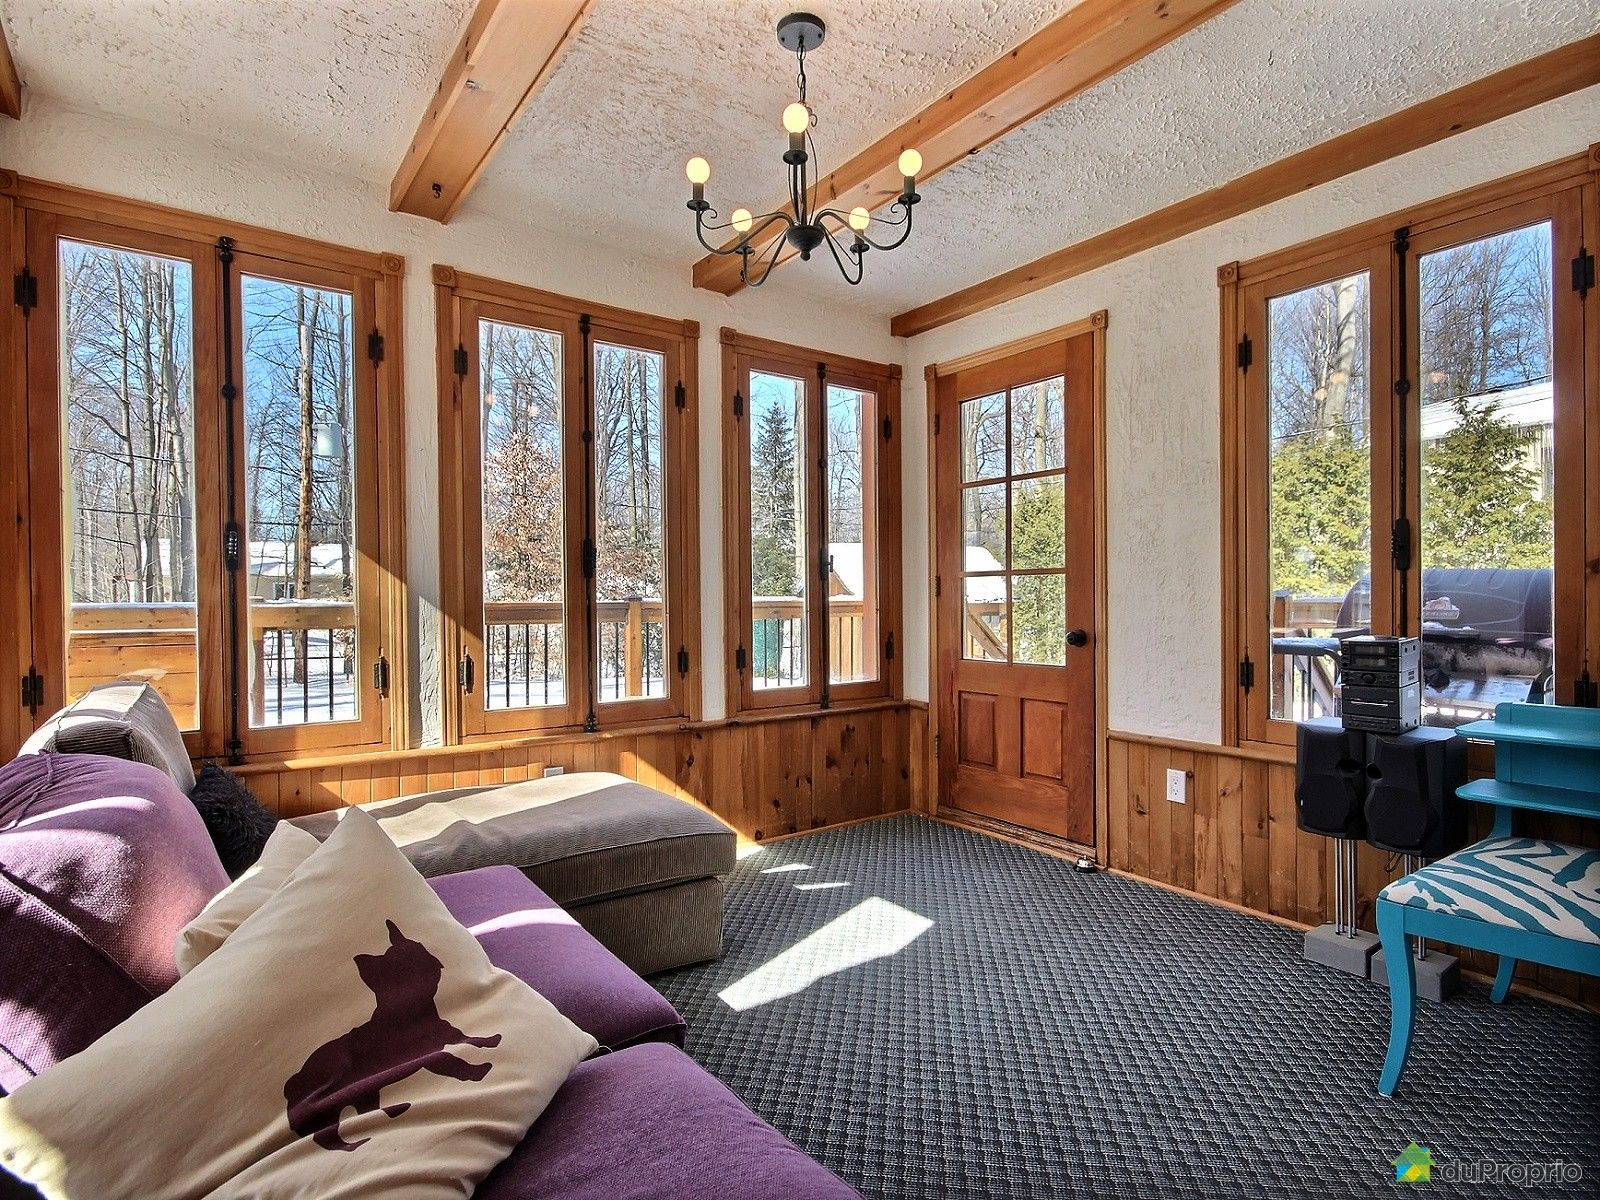 verriere maison 20171030145853. Black Bedroom Furniture Sets. Home Design Ideas